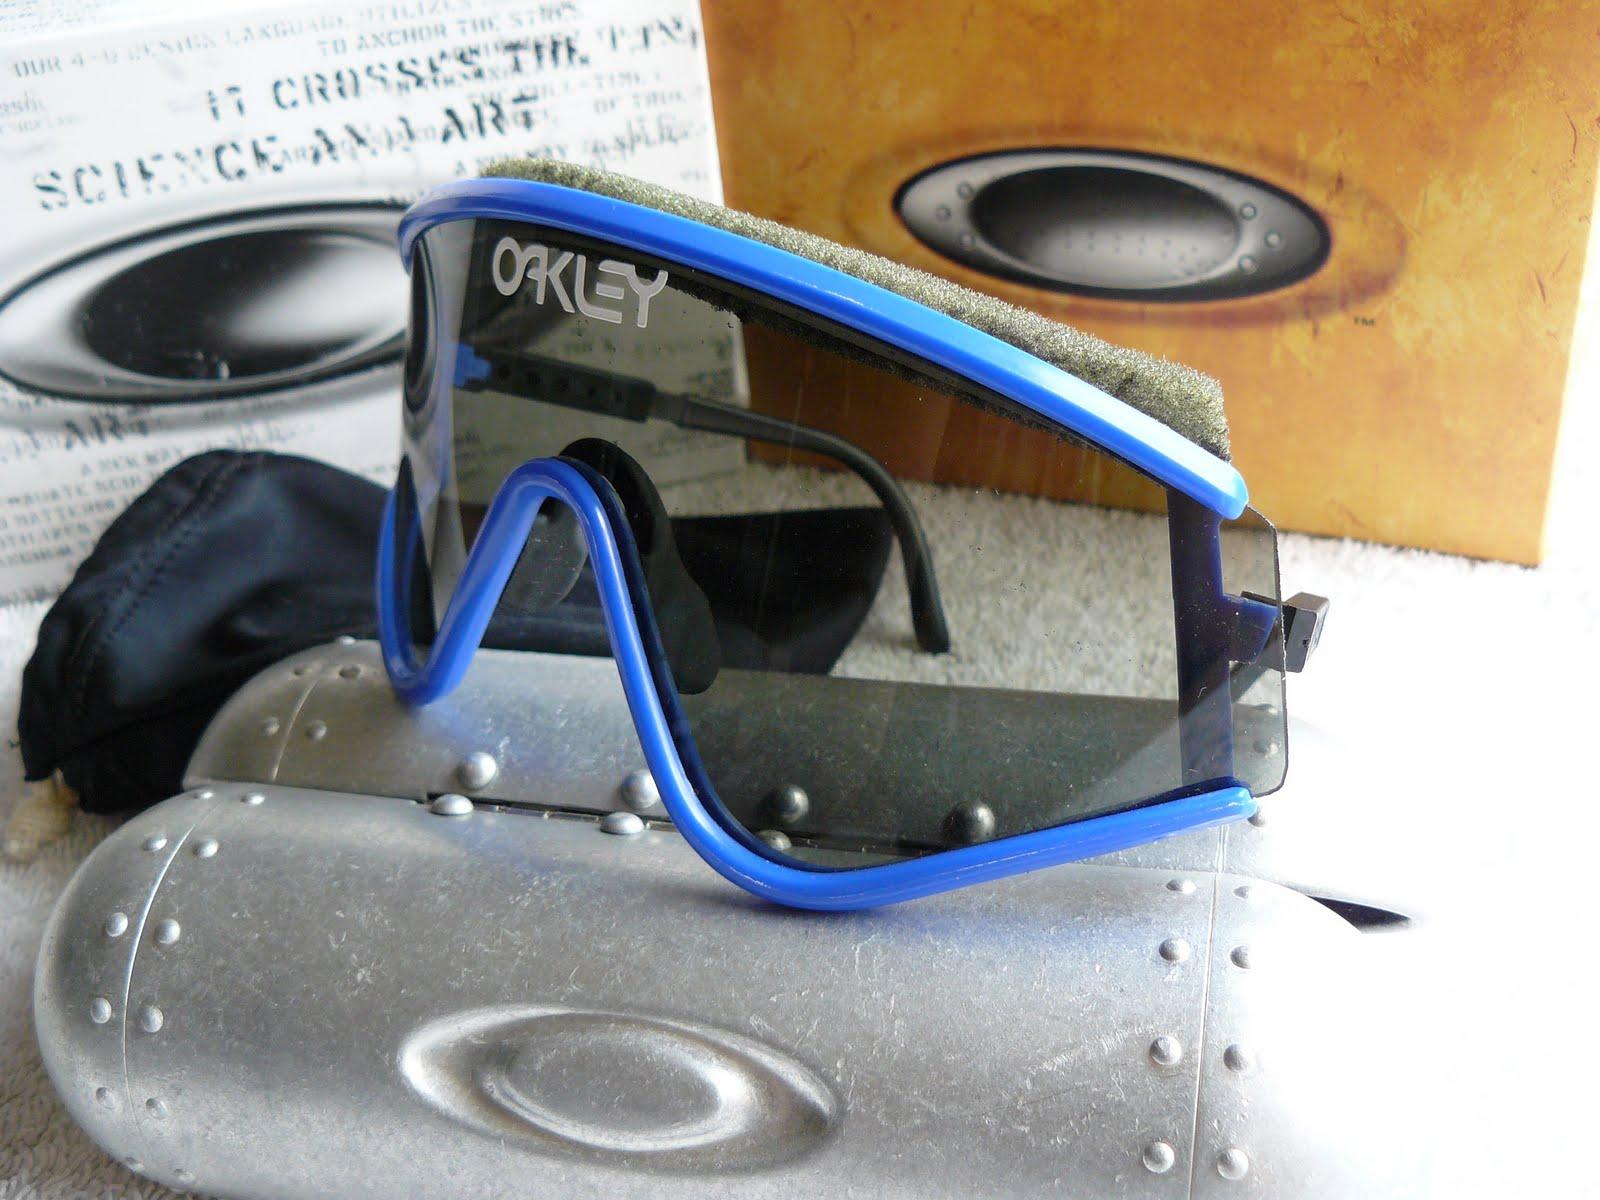 dcd47084b451 Eyeshade Factory Pilot (1984) Blue frame with Grey lenses. SKU 03-012